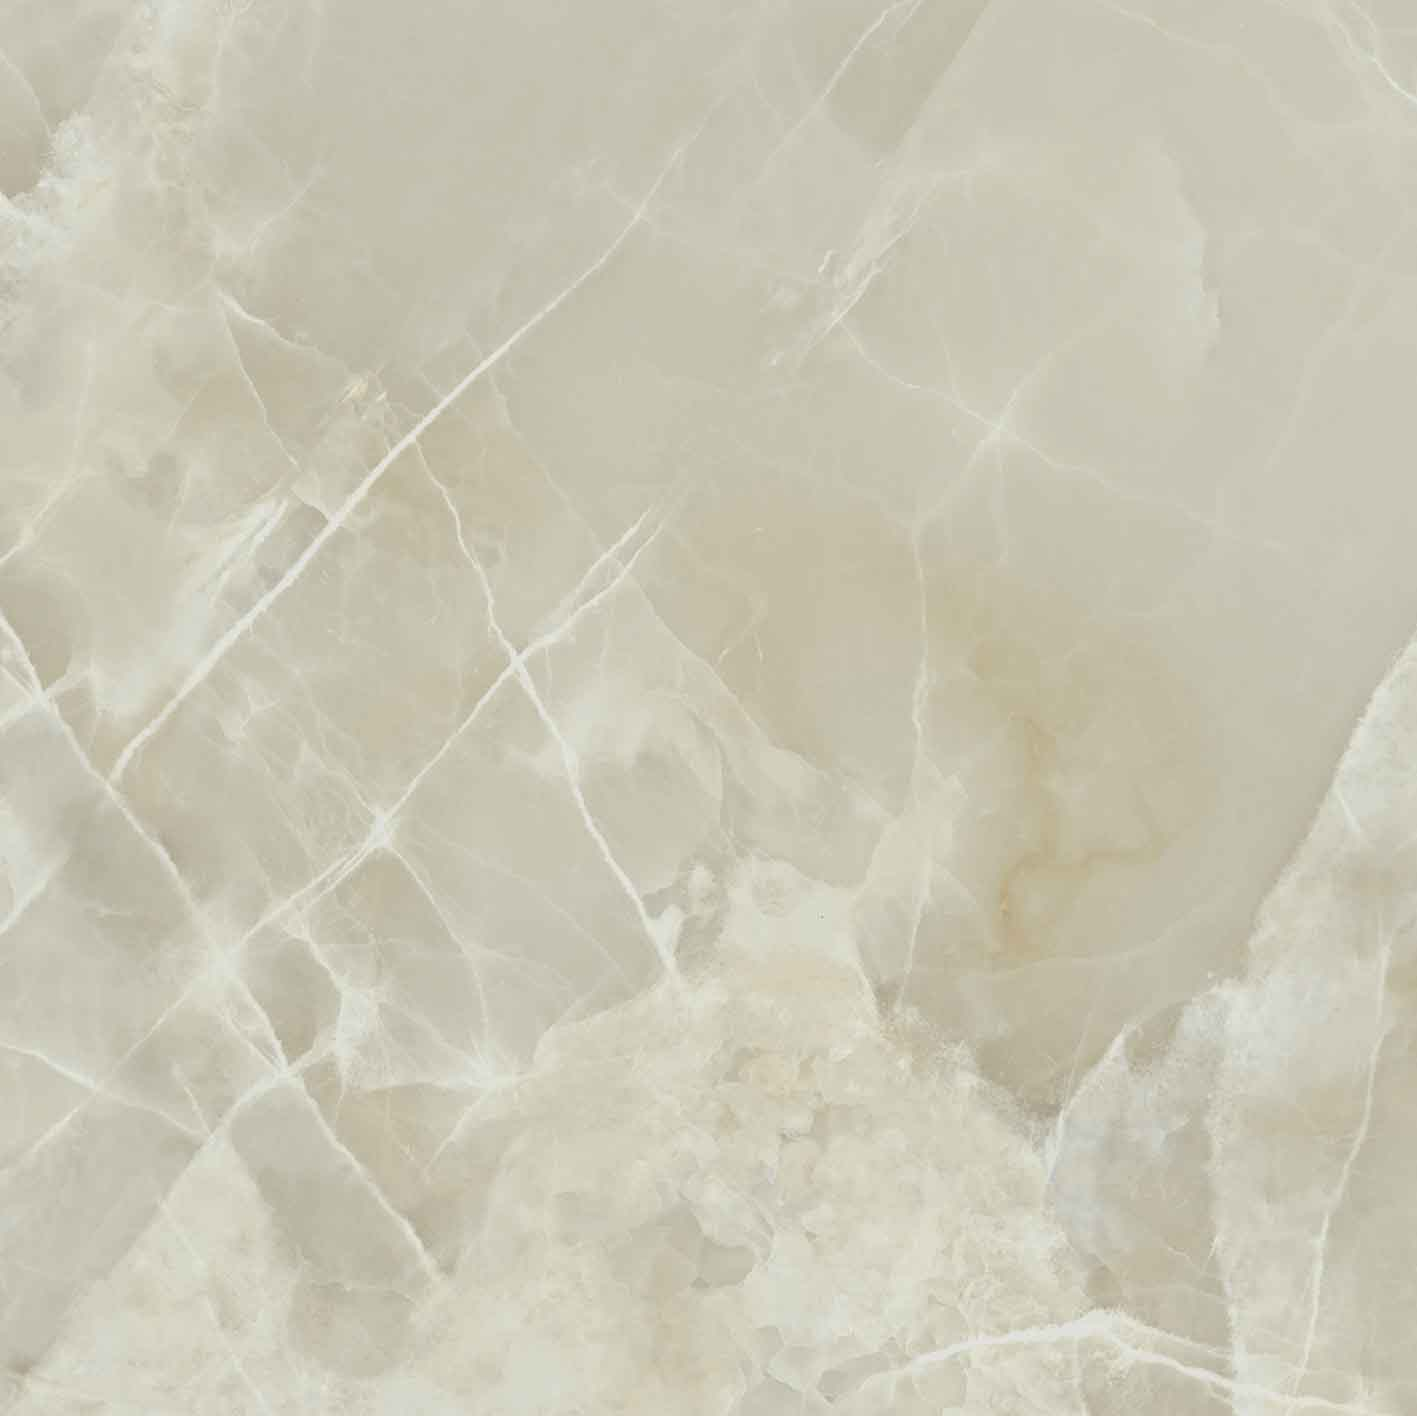 Exalt of Cerim Oyster Shade Glossy 10mm 60 x 60